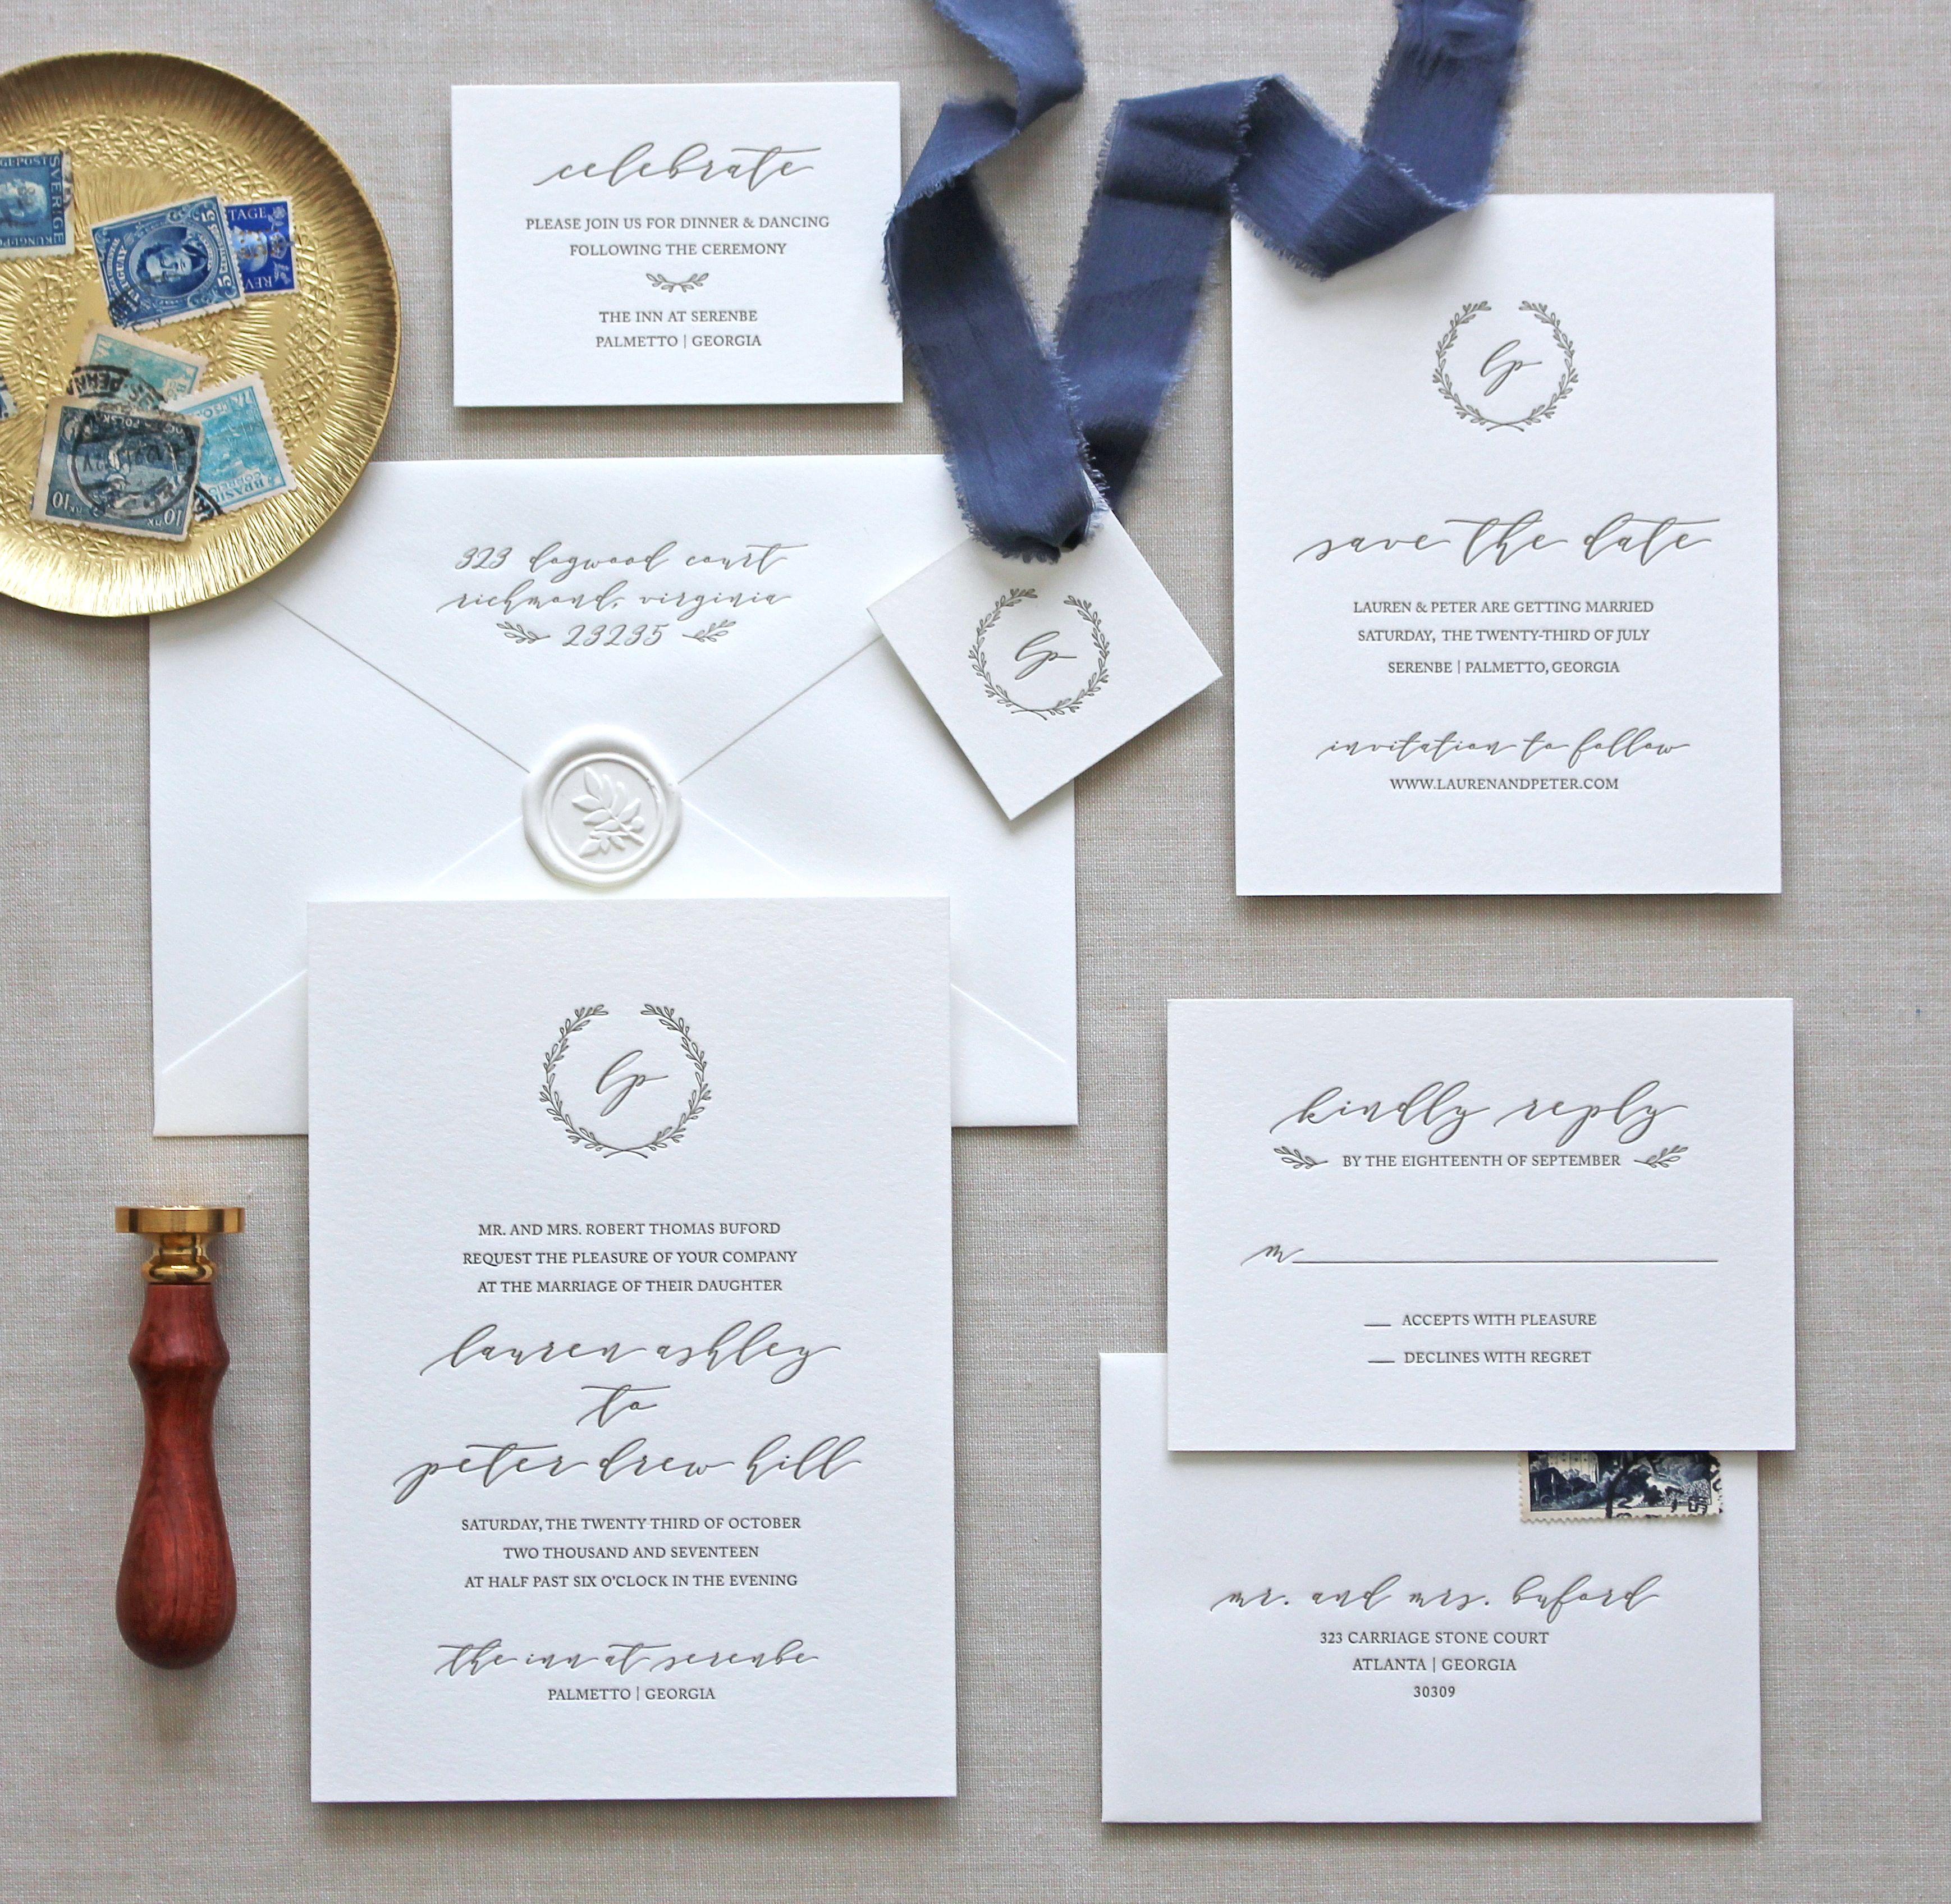 Letterpress wedding invitations // Serenbe design // CHATHAM & CARON ...